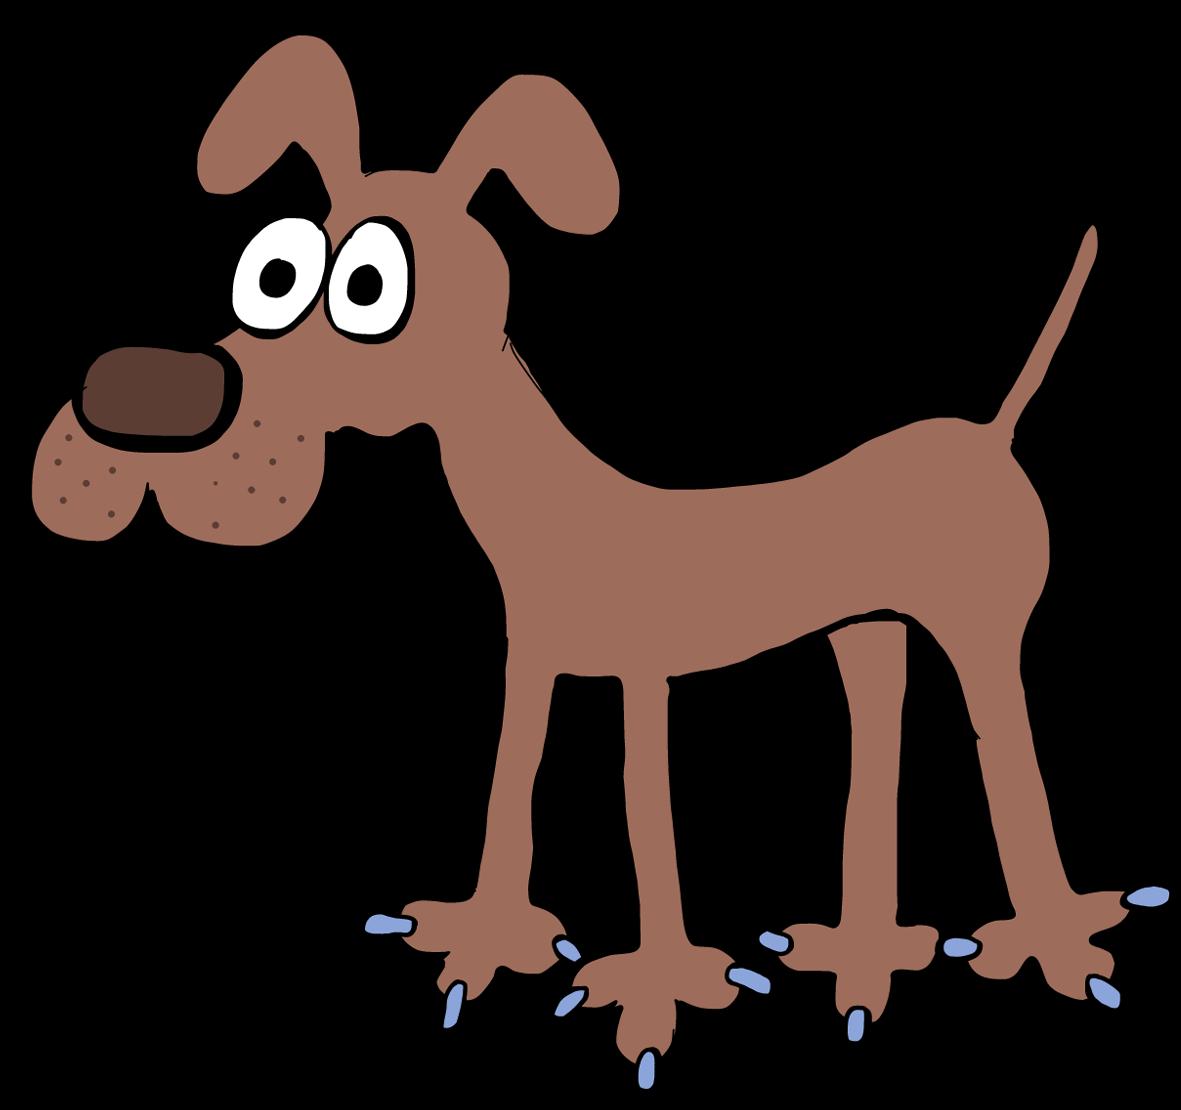 microsoft dog clipart - photo #28